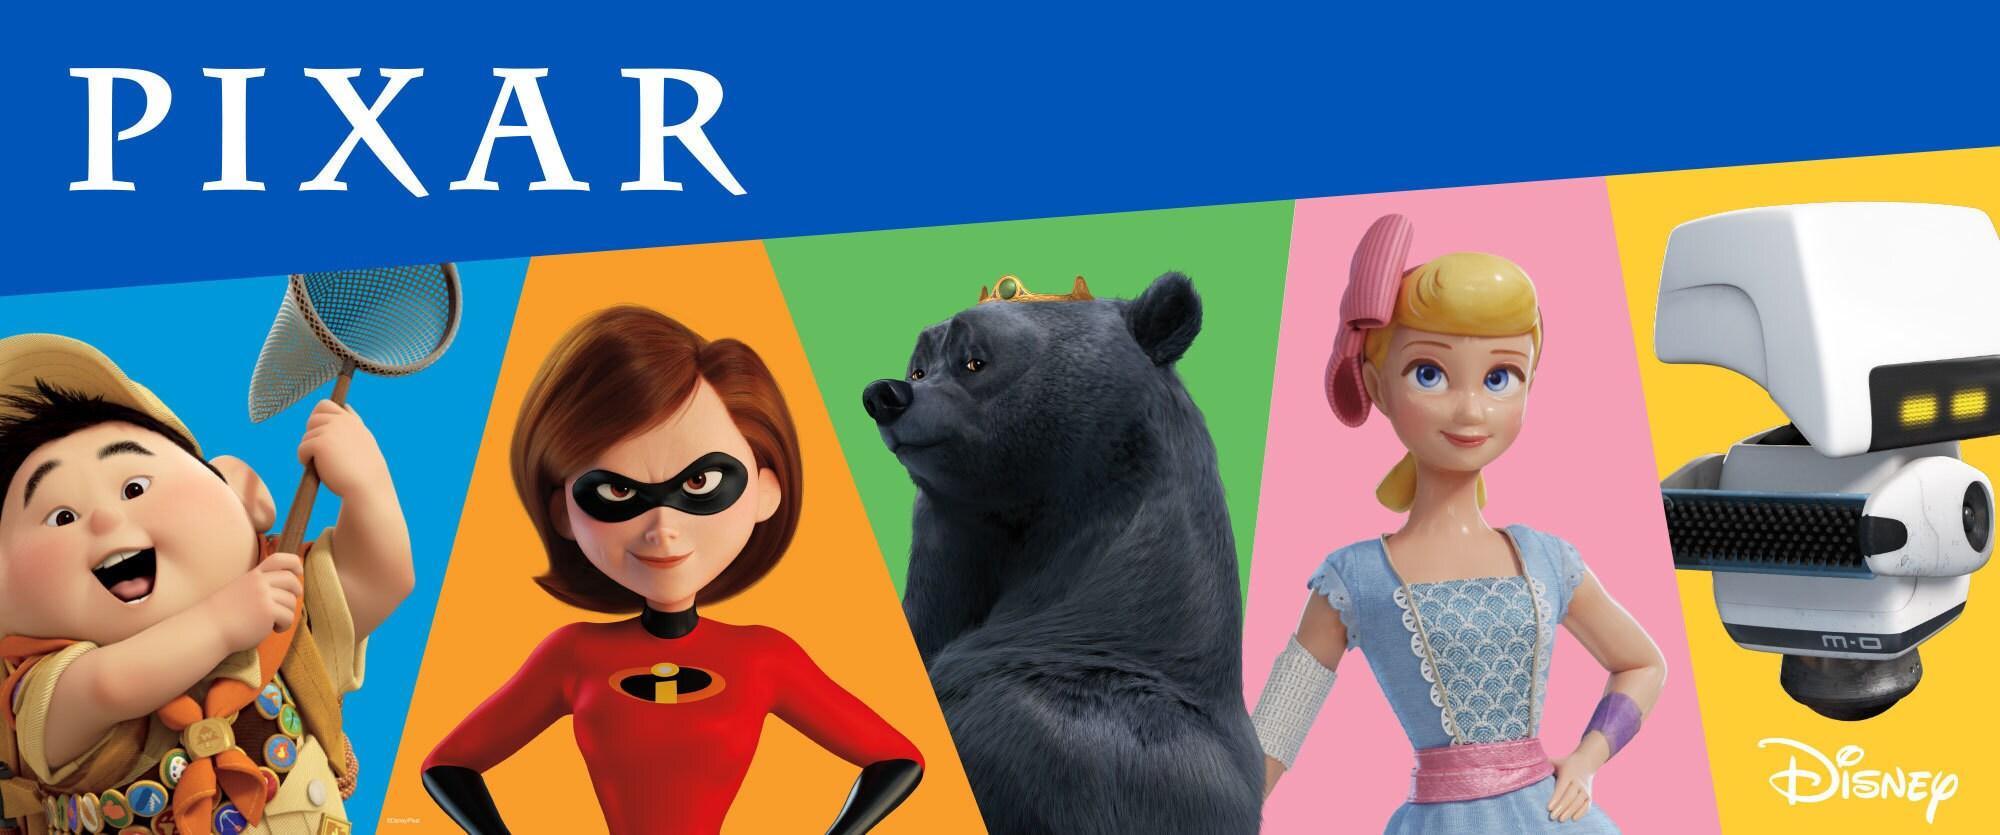 Top_ShopDisney_Pixar_Jun20_MX